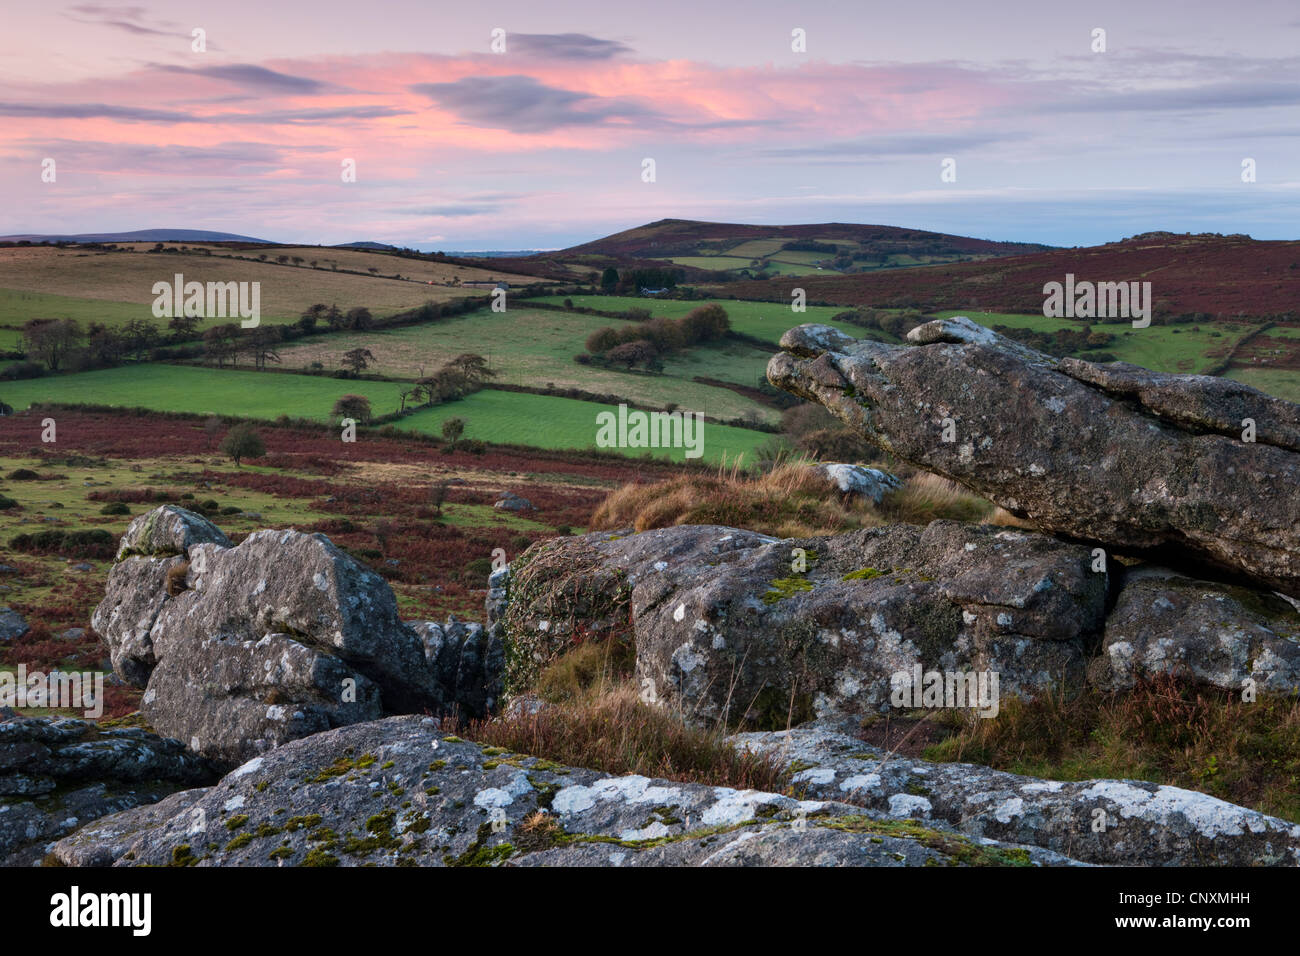 Twilight over Dartmoor countryside viewed from Hound Tor, Dartmoor, Devon, England. Autumn (October) 2011. - Stock Image